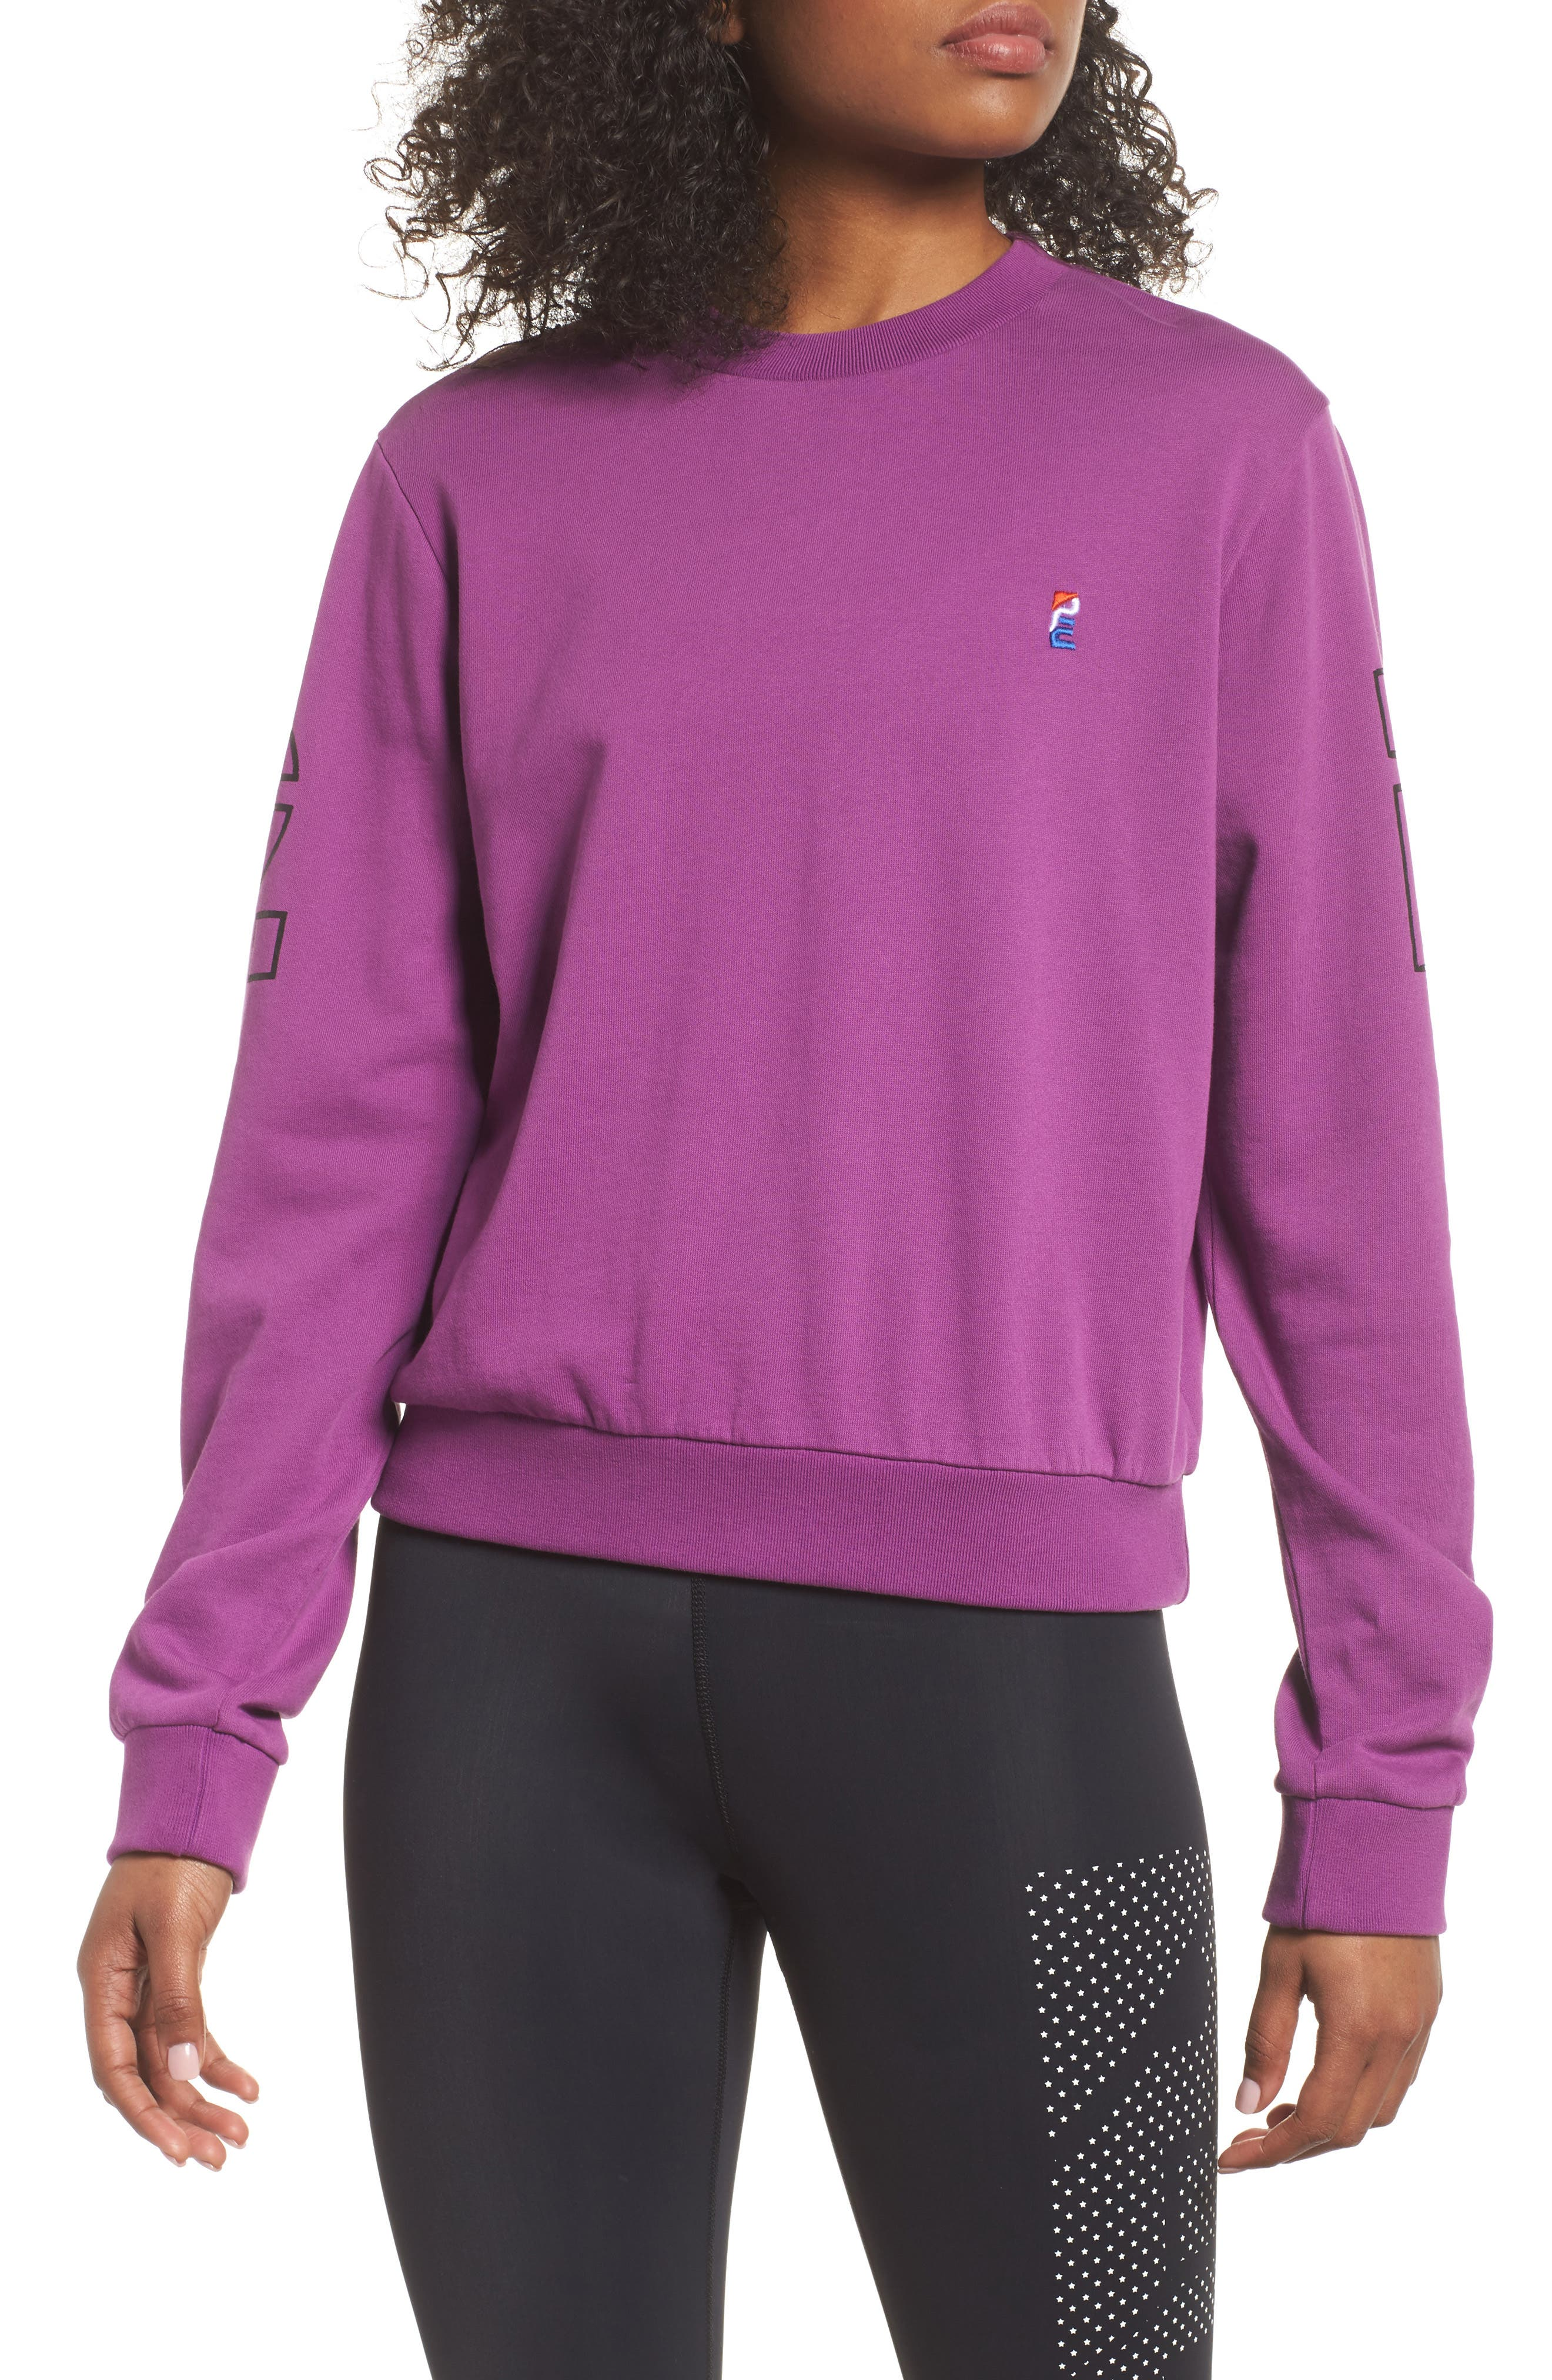 Moneyball Sweatshirt,                             Main thumbnail 1, color,                             500